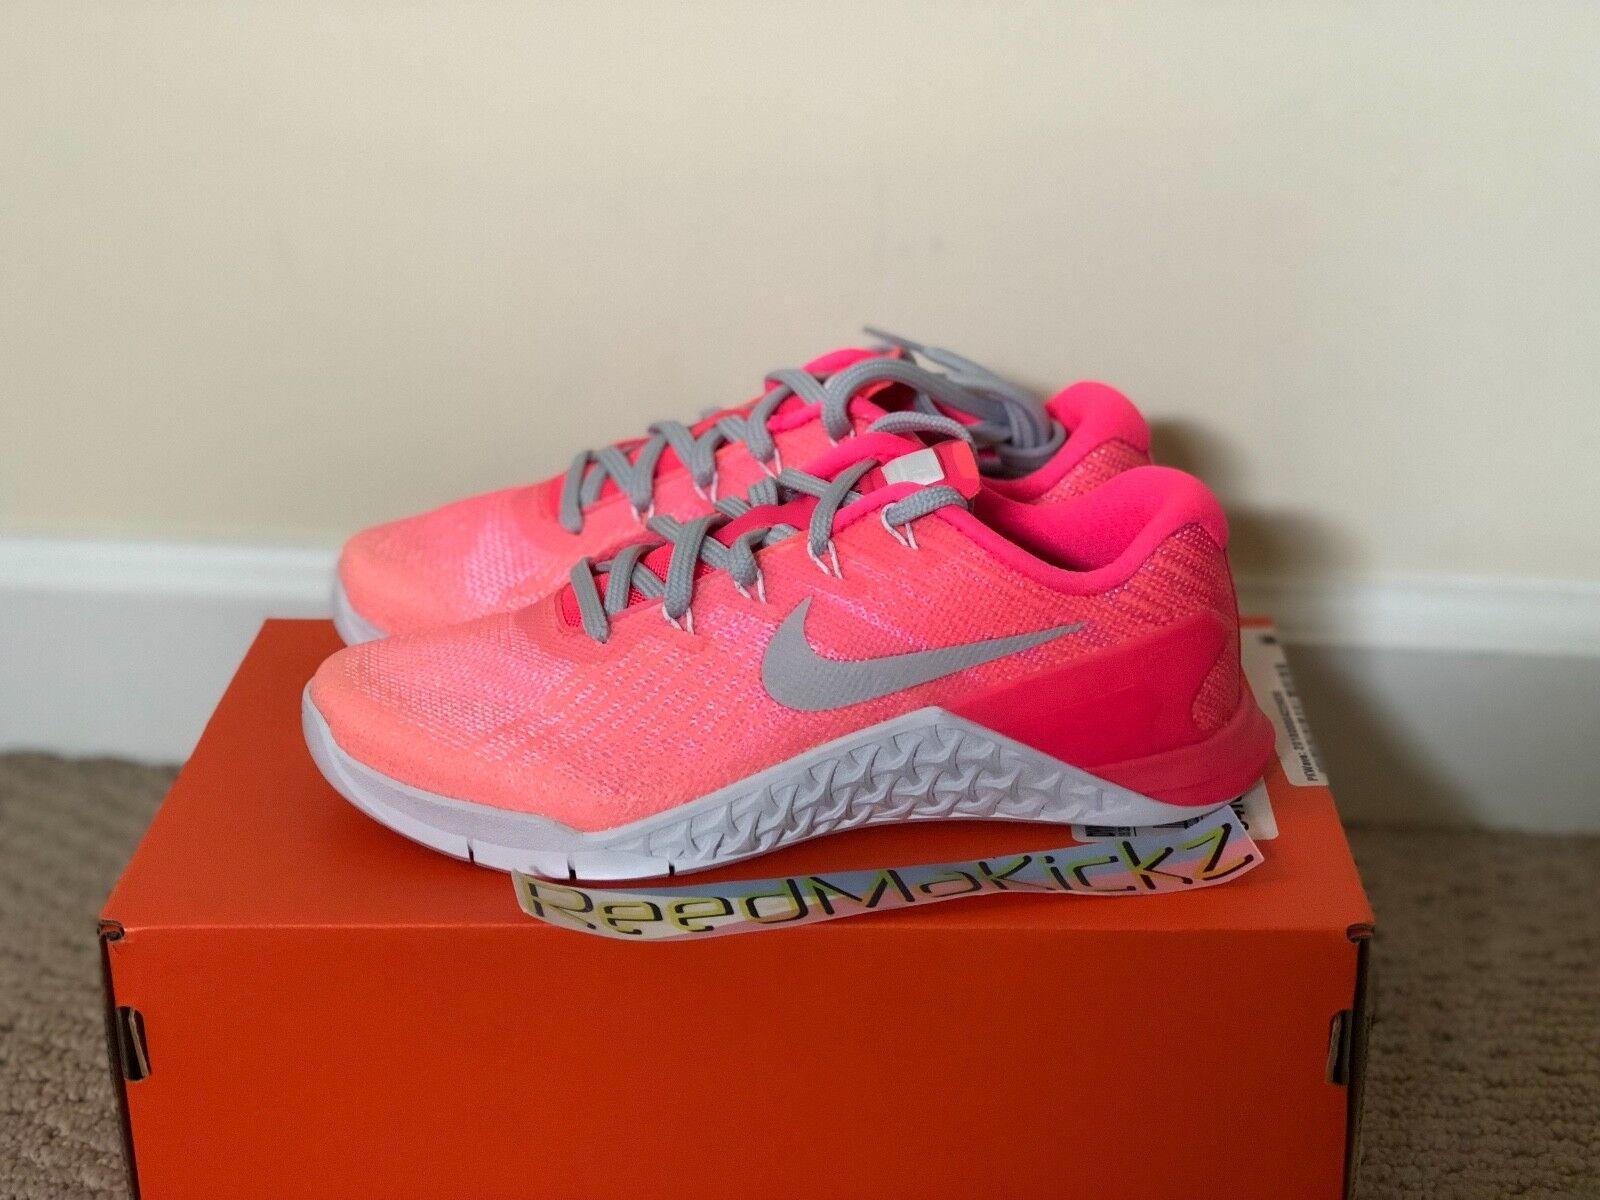 Nike Metcon 3 Fade Pink Sunset Glow womens sizes 902175 800